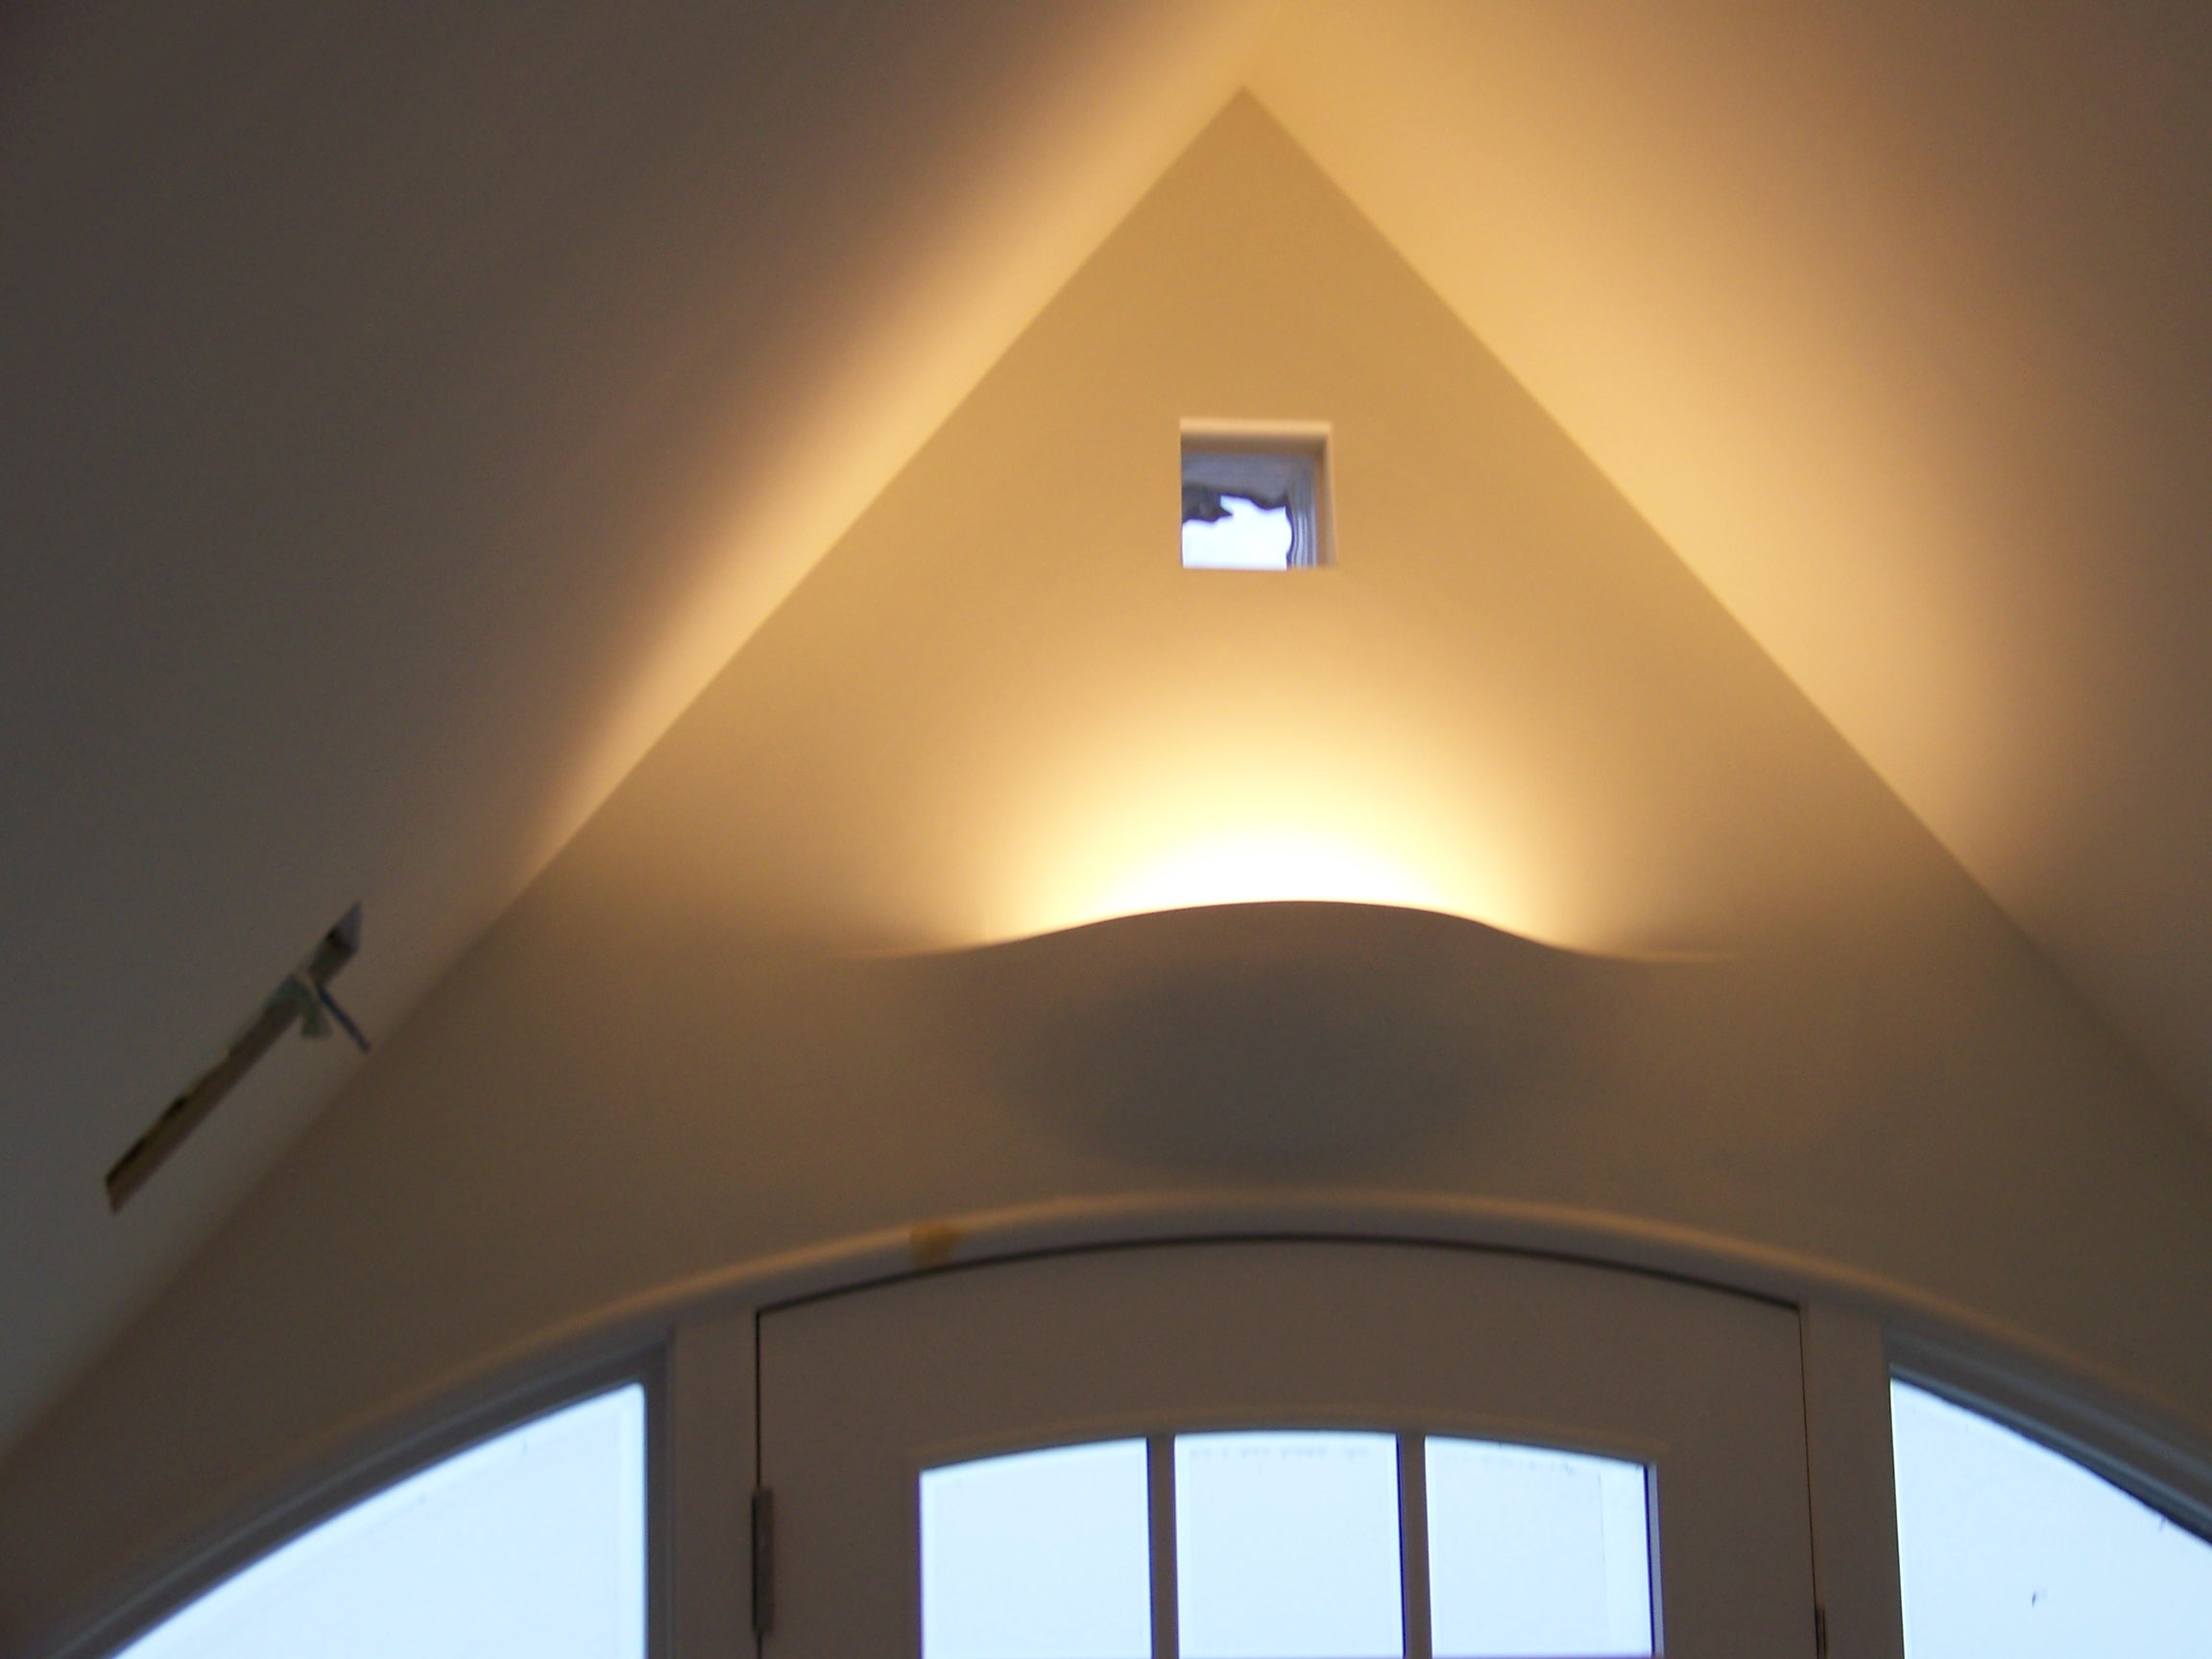 Plaster Finish on Light